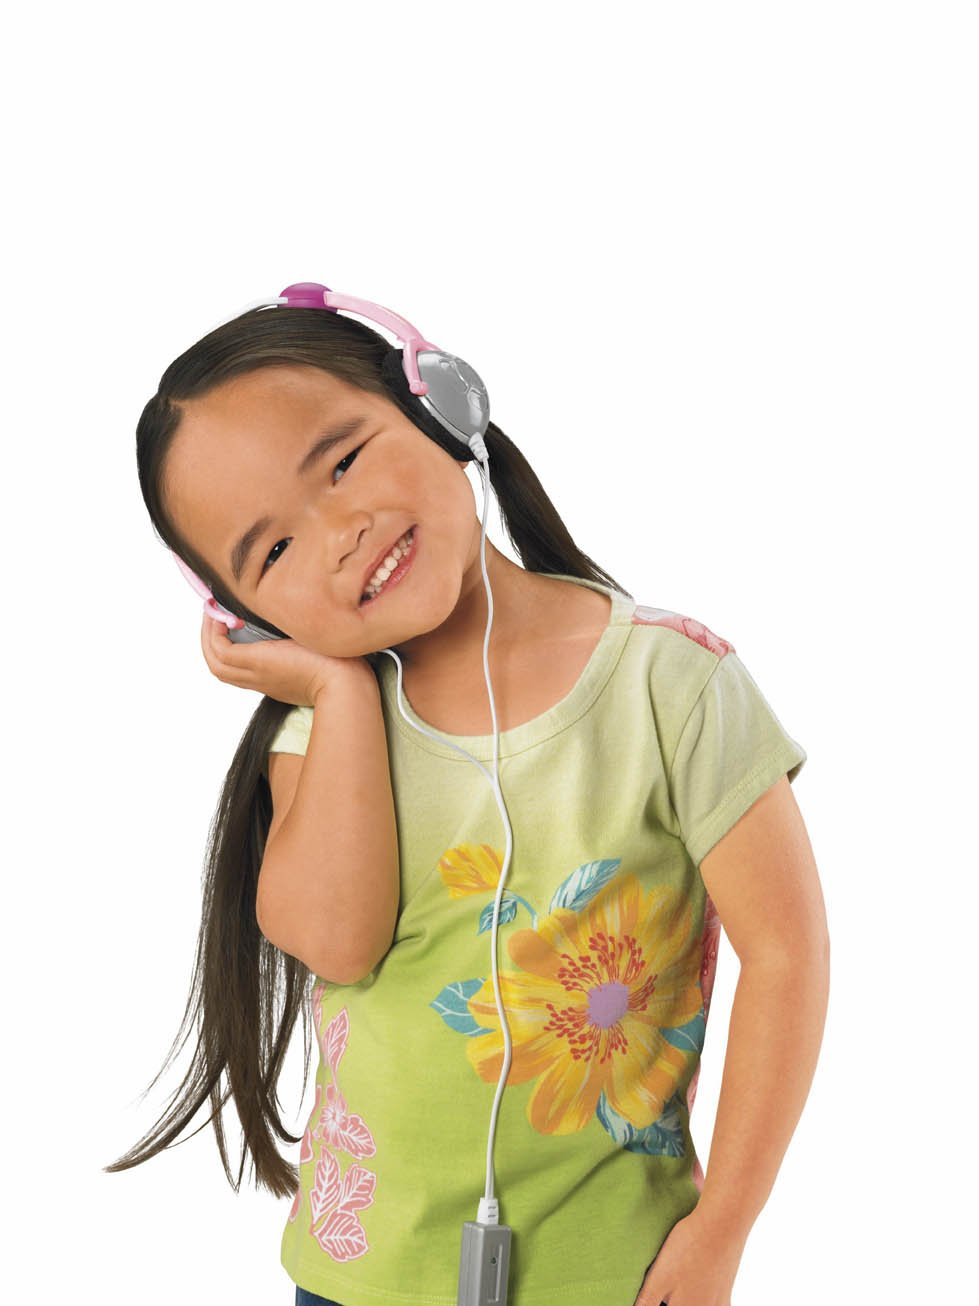 Fisher-Price Kid-Tough Headphones Pink